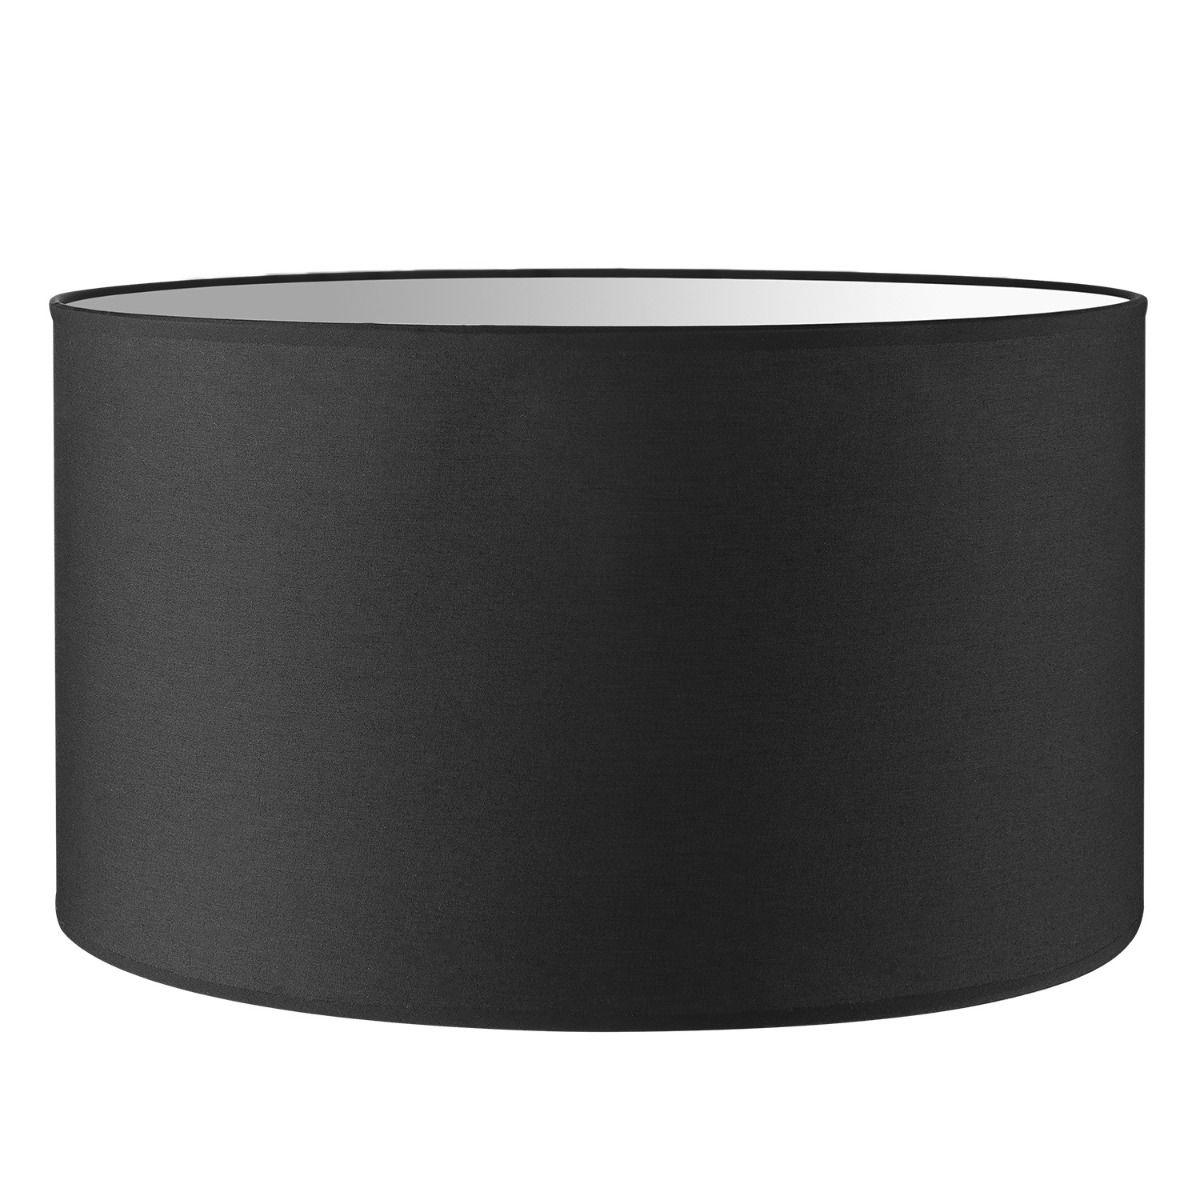 Home sweet home lampenkap Bling 40 - zwart